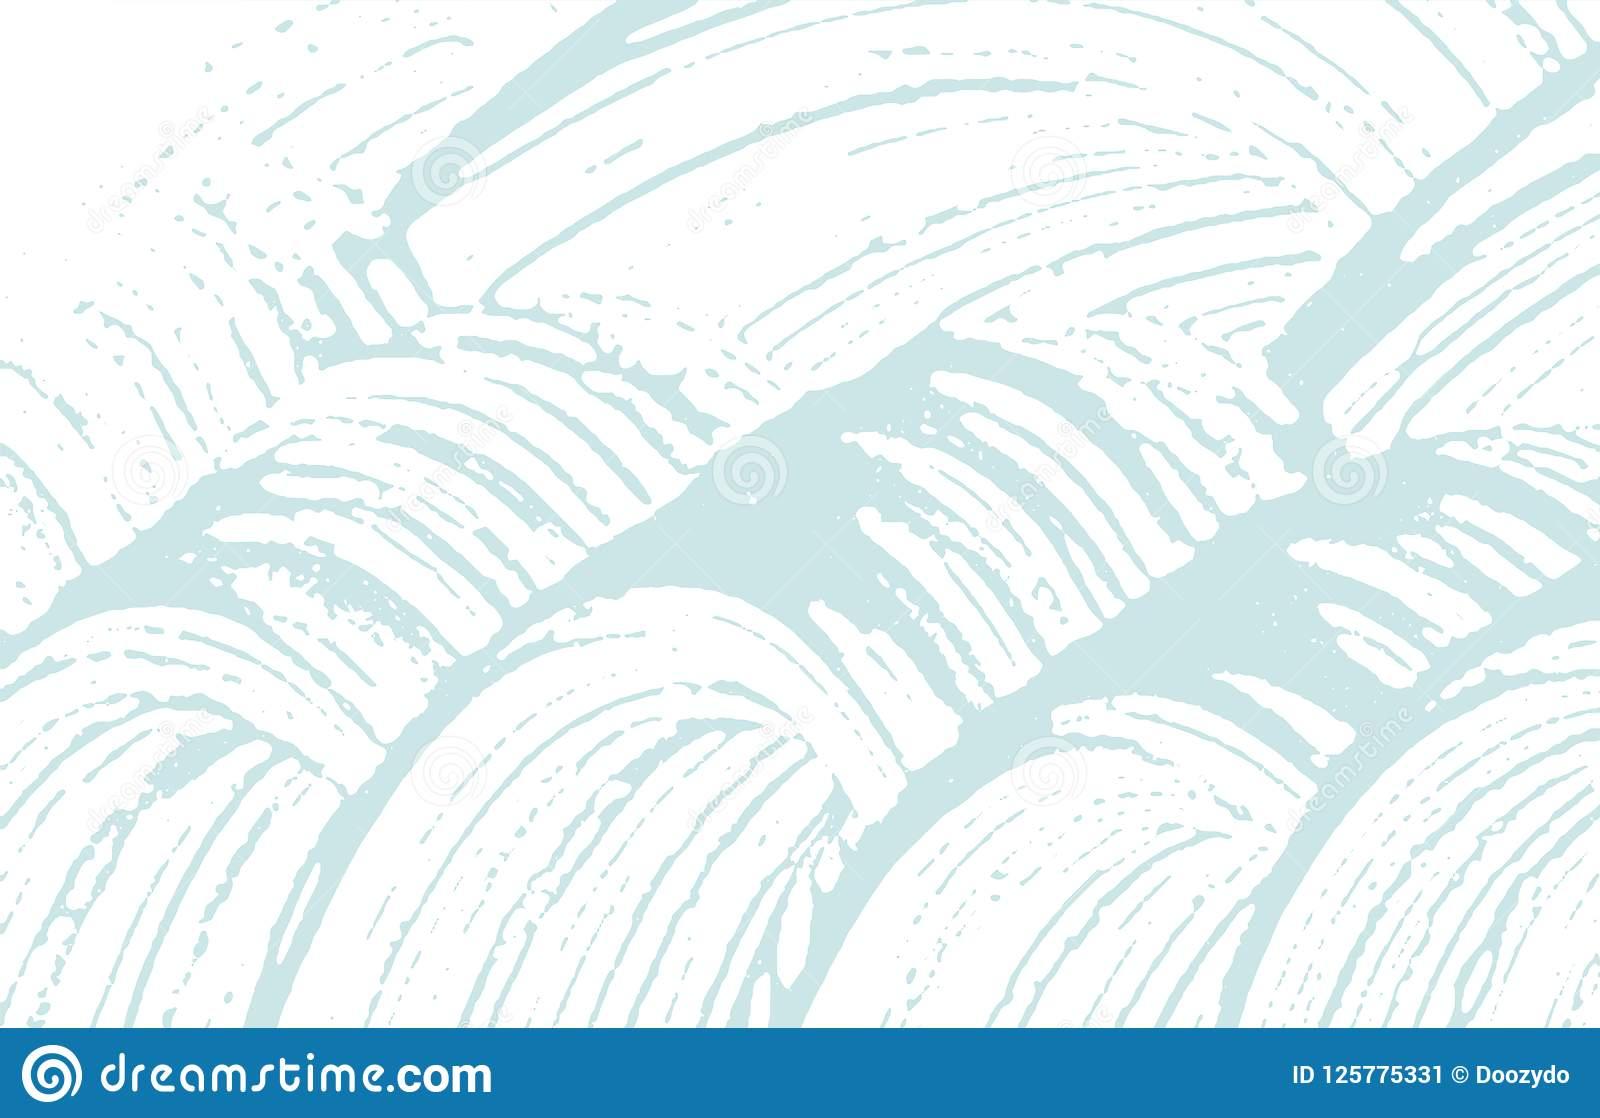 Grunge Texture. Distress Blue Rough Trace. Bold Background